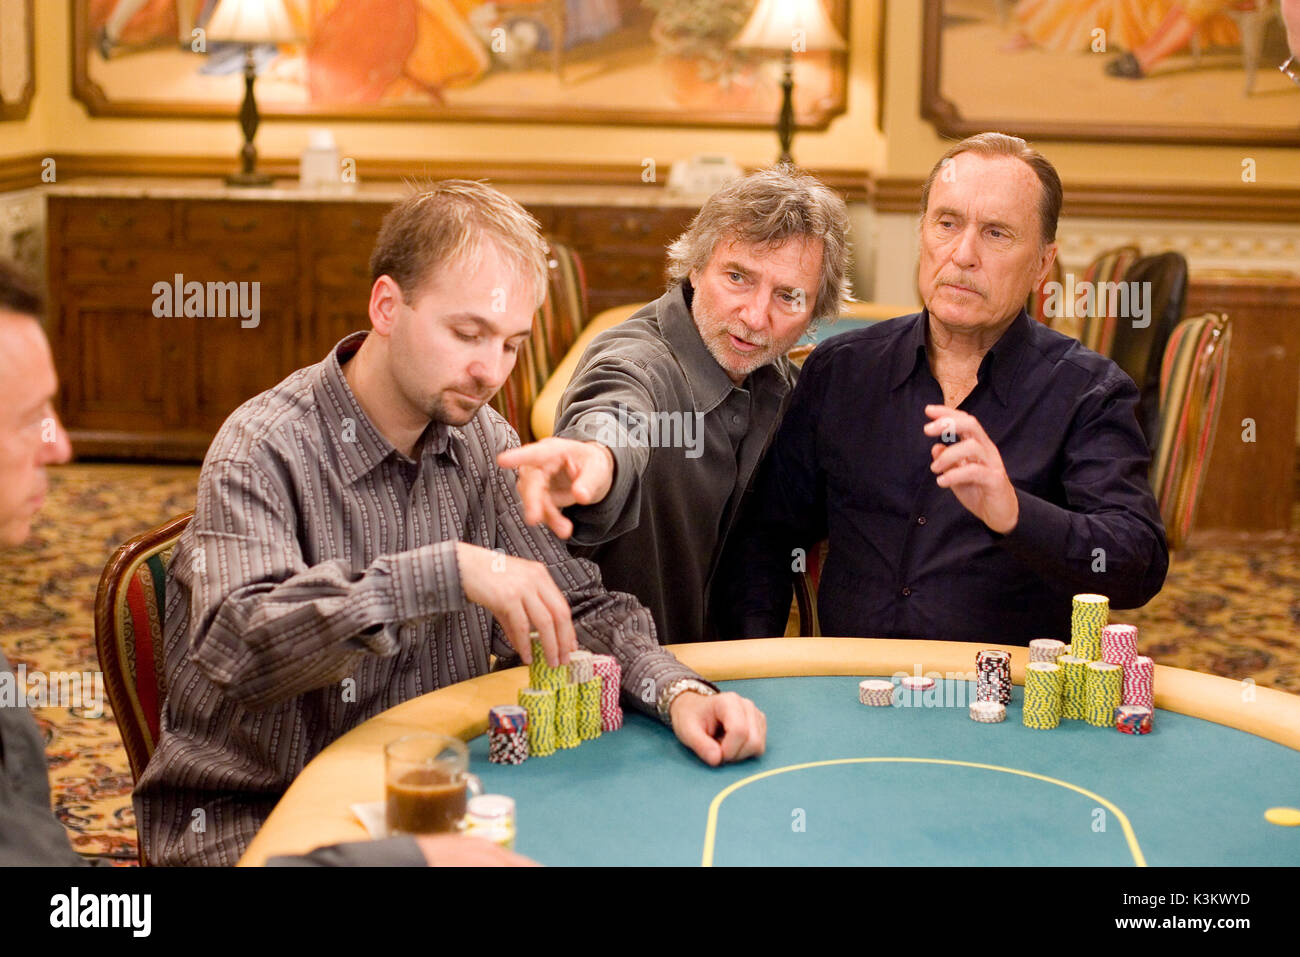 Lucky You Poker Pro Daniel Negreanu Director Curtis Hanson Robert Stock Photo Alamy